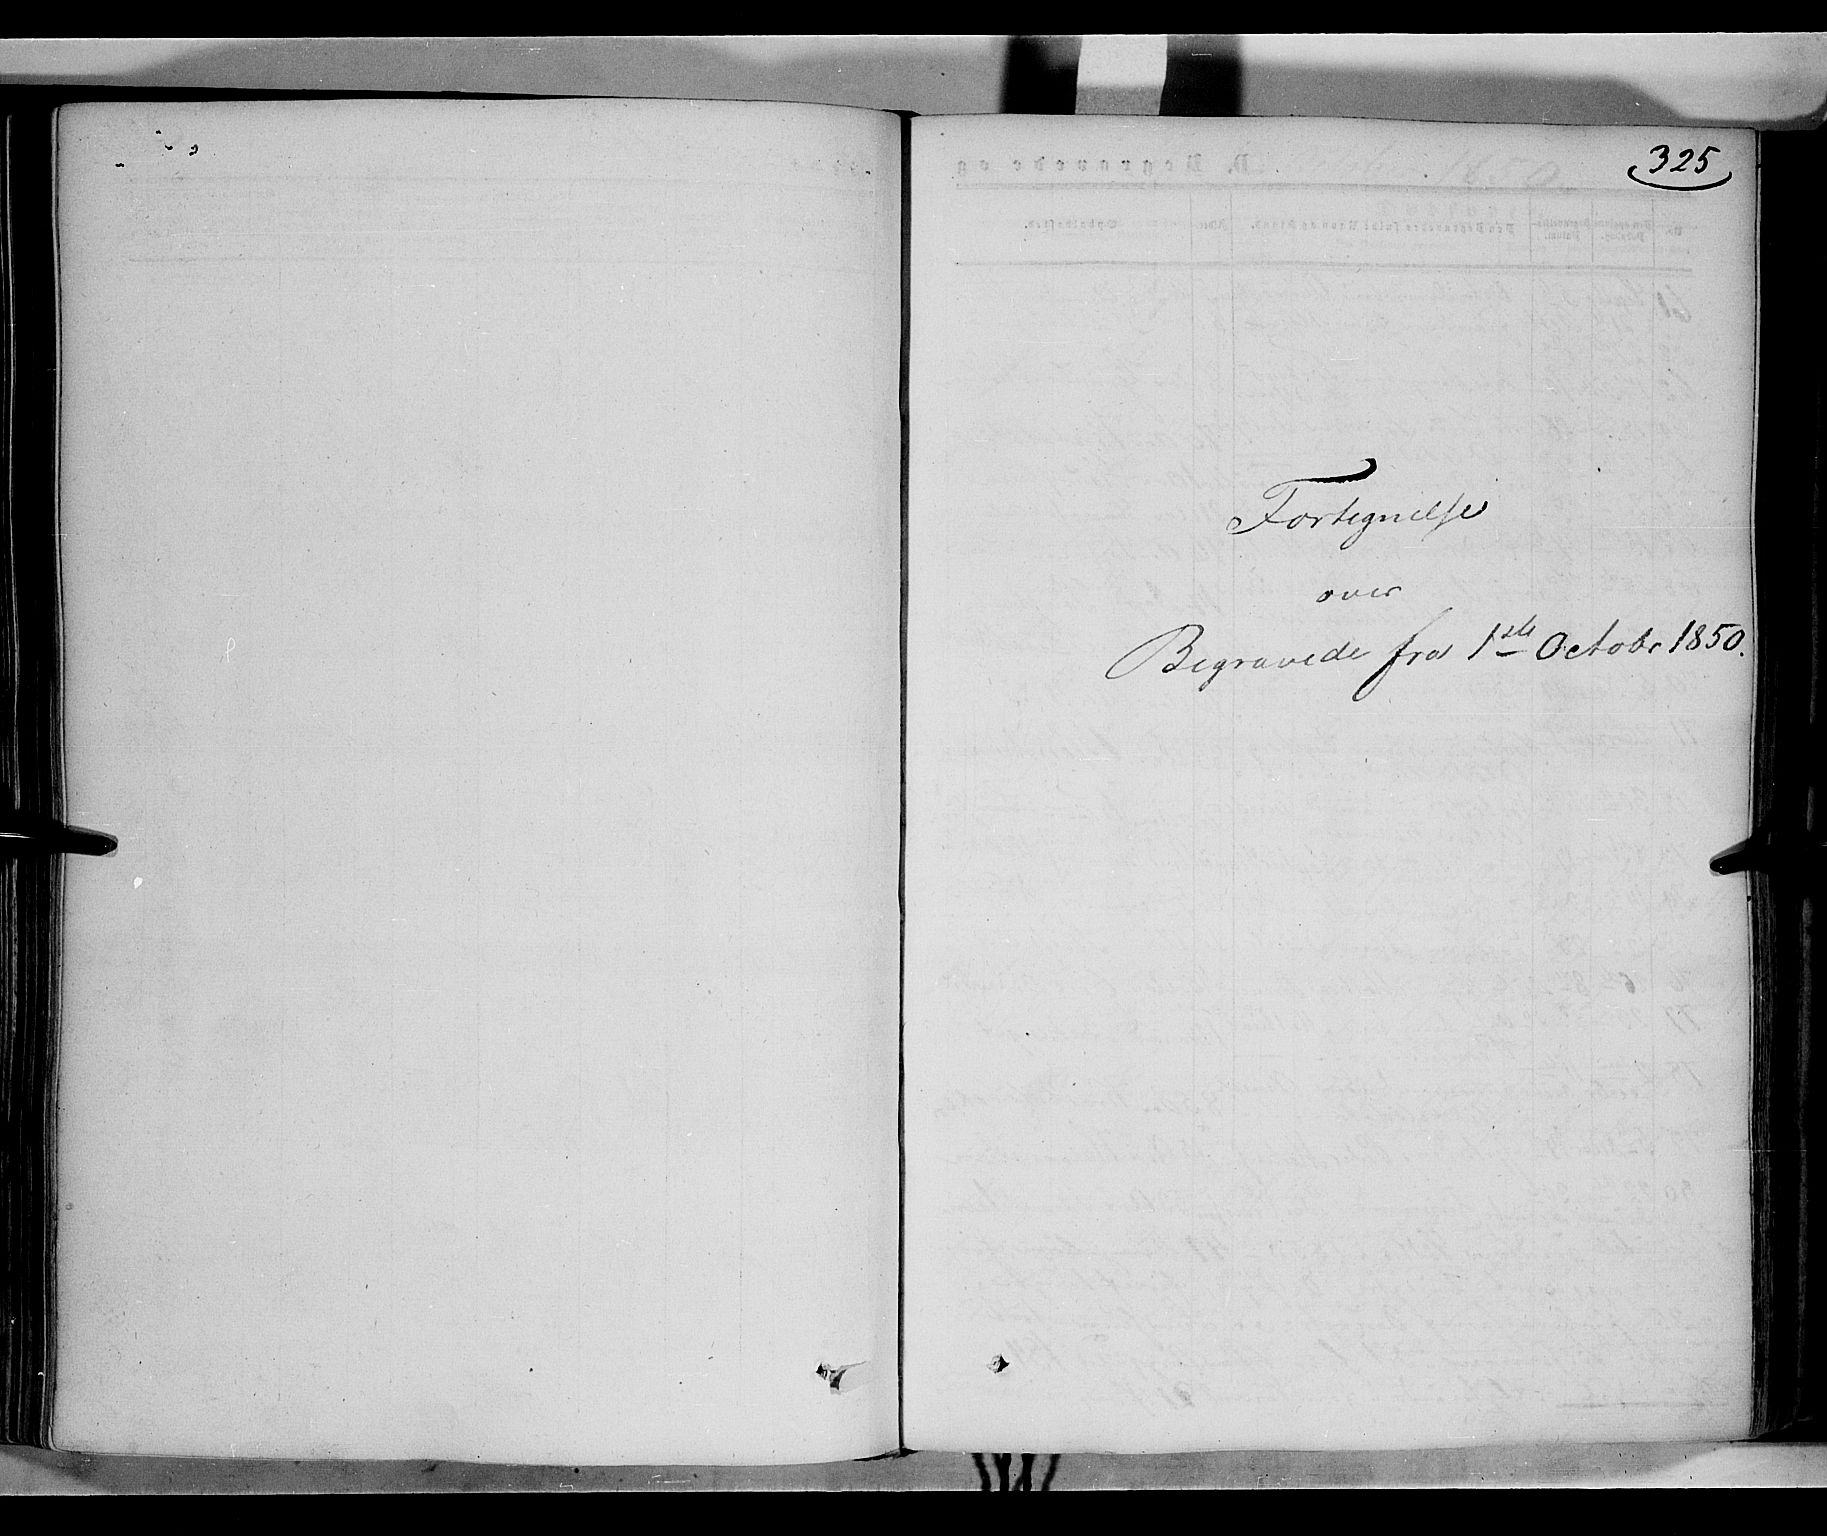 SAH, Gausdal prestekontor, Ministerialbok nr. 8, 1850-1861, s. 325